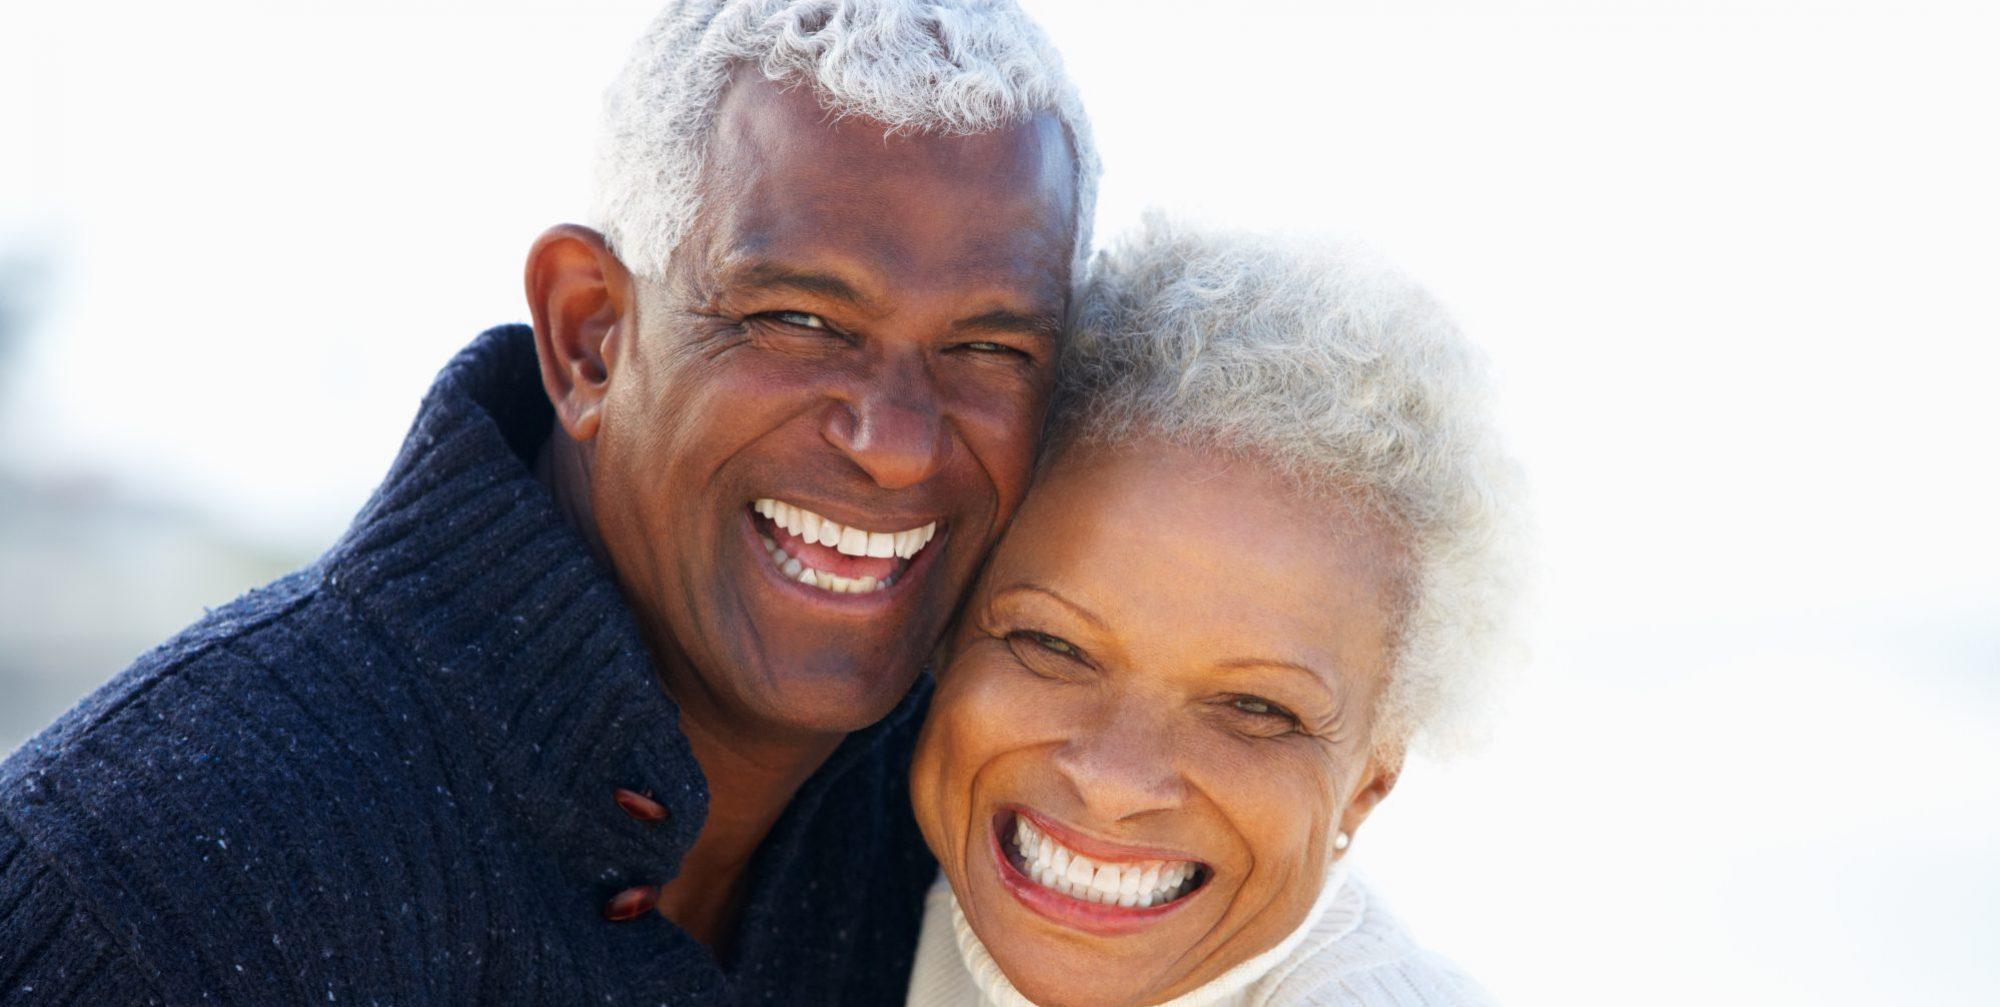 Zionsville-Dentist-Near-Me-46077 Happy Couple